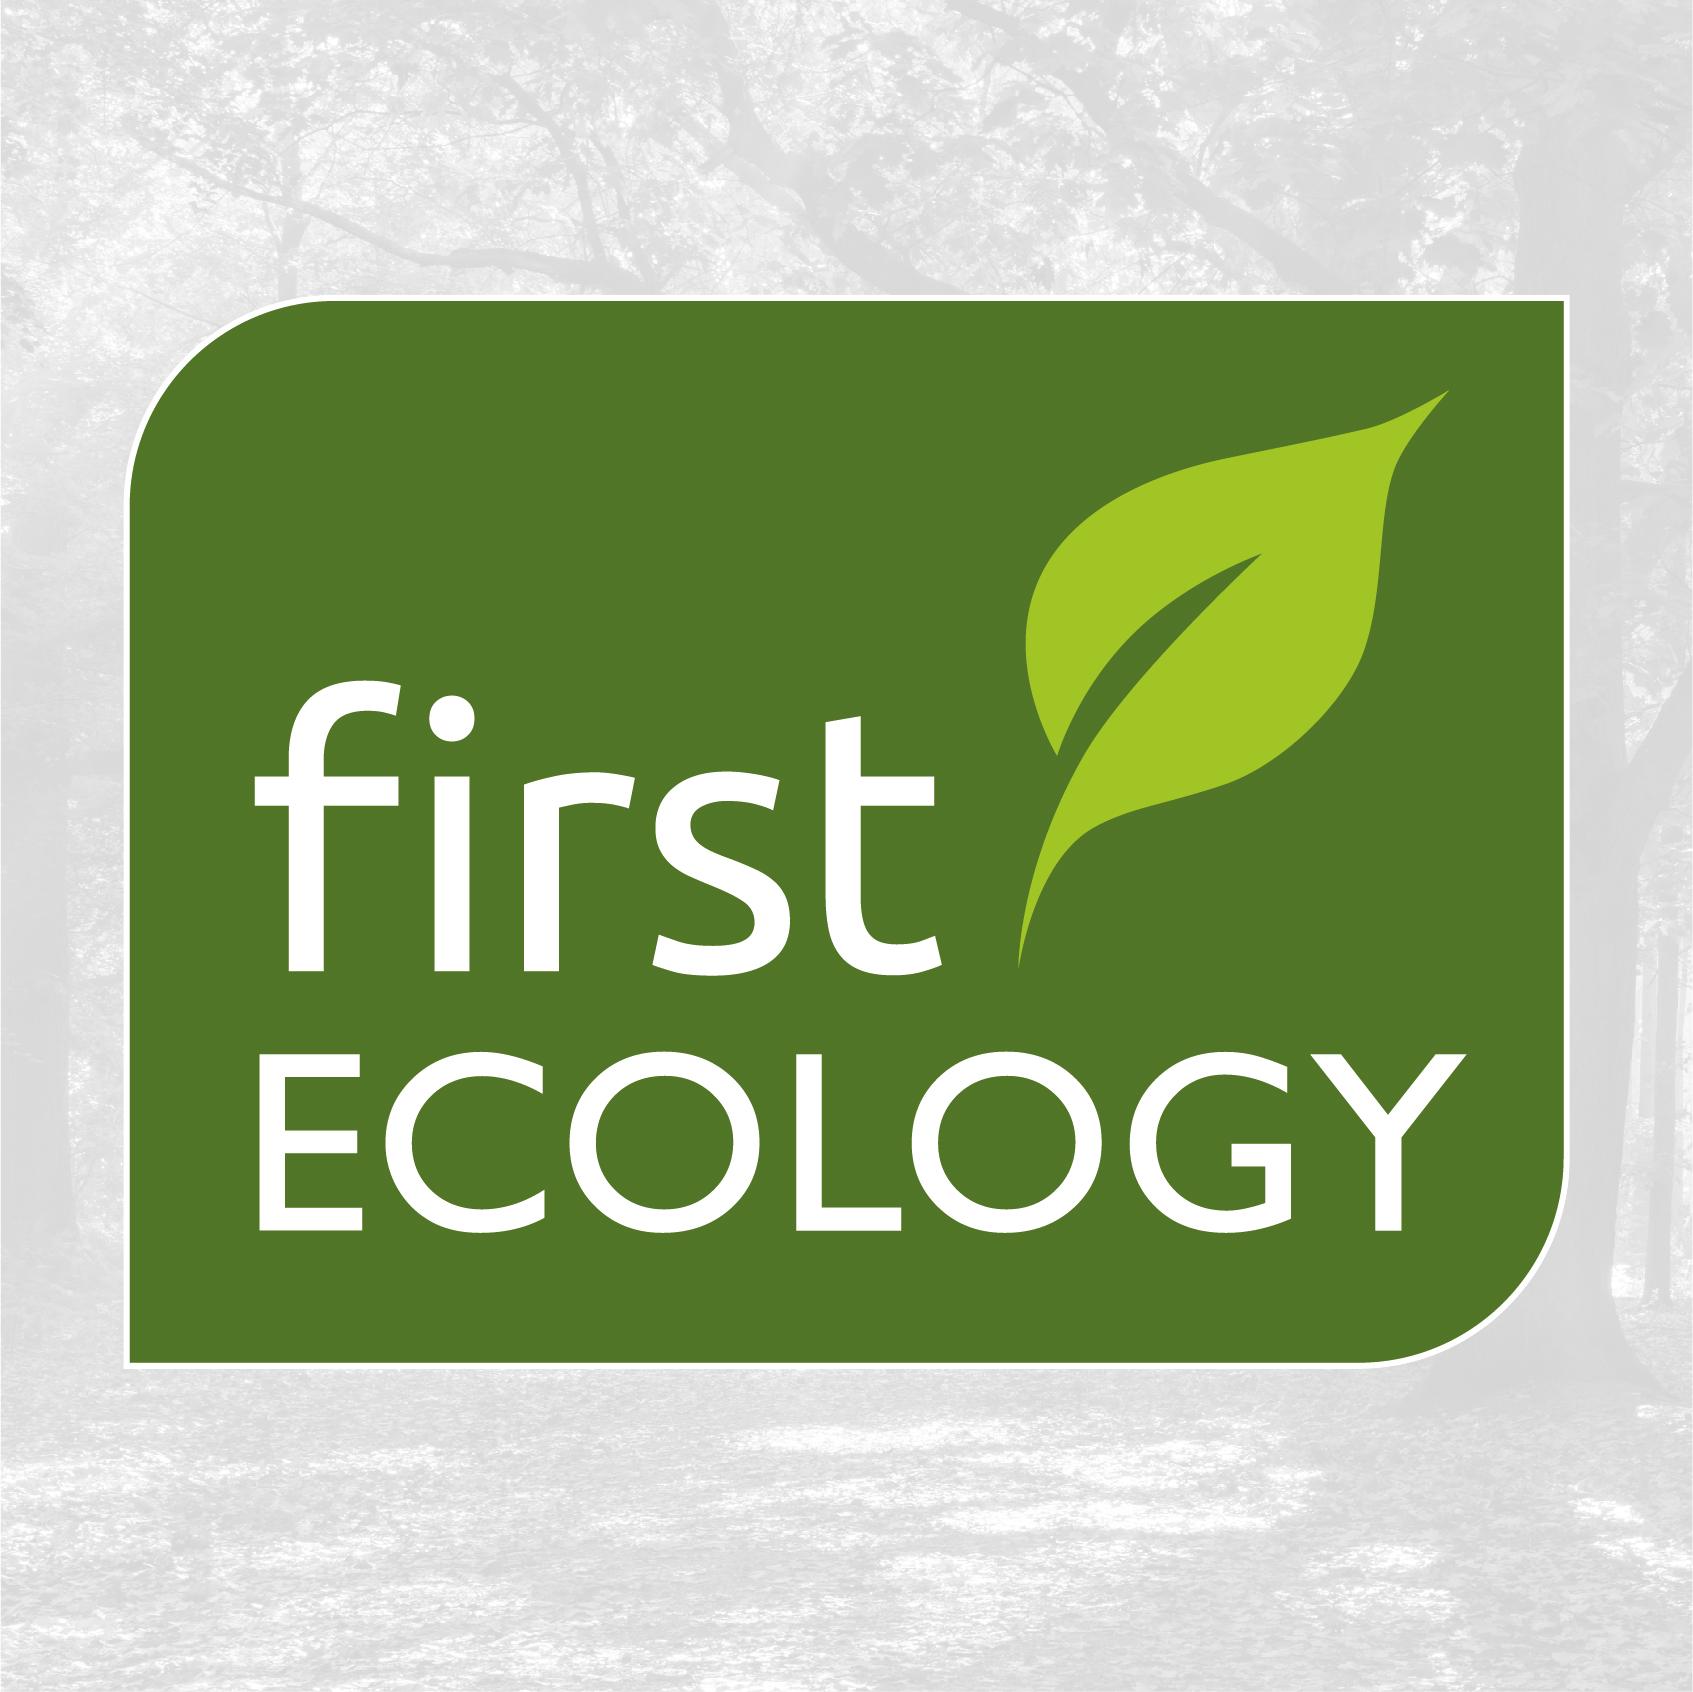 FIRST ECOLOGY branding